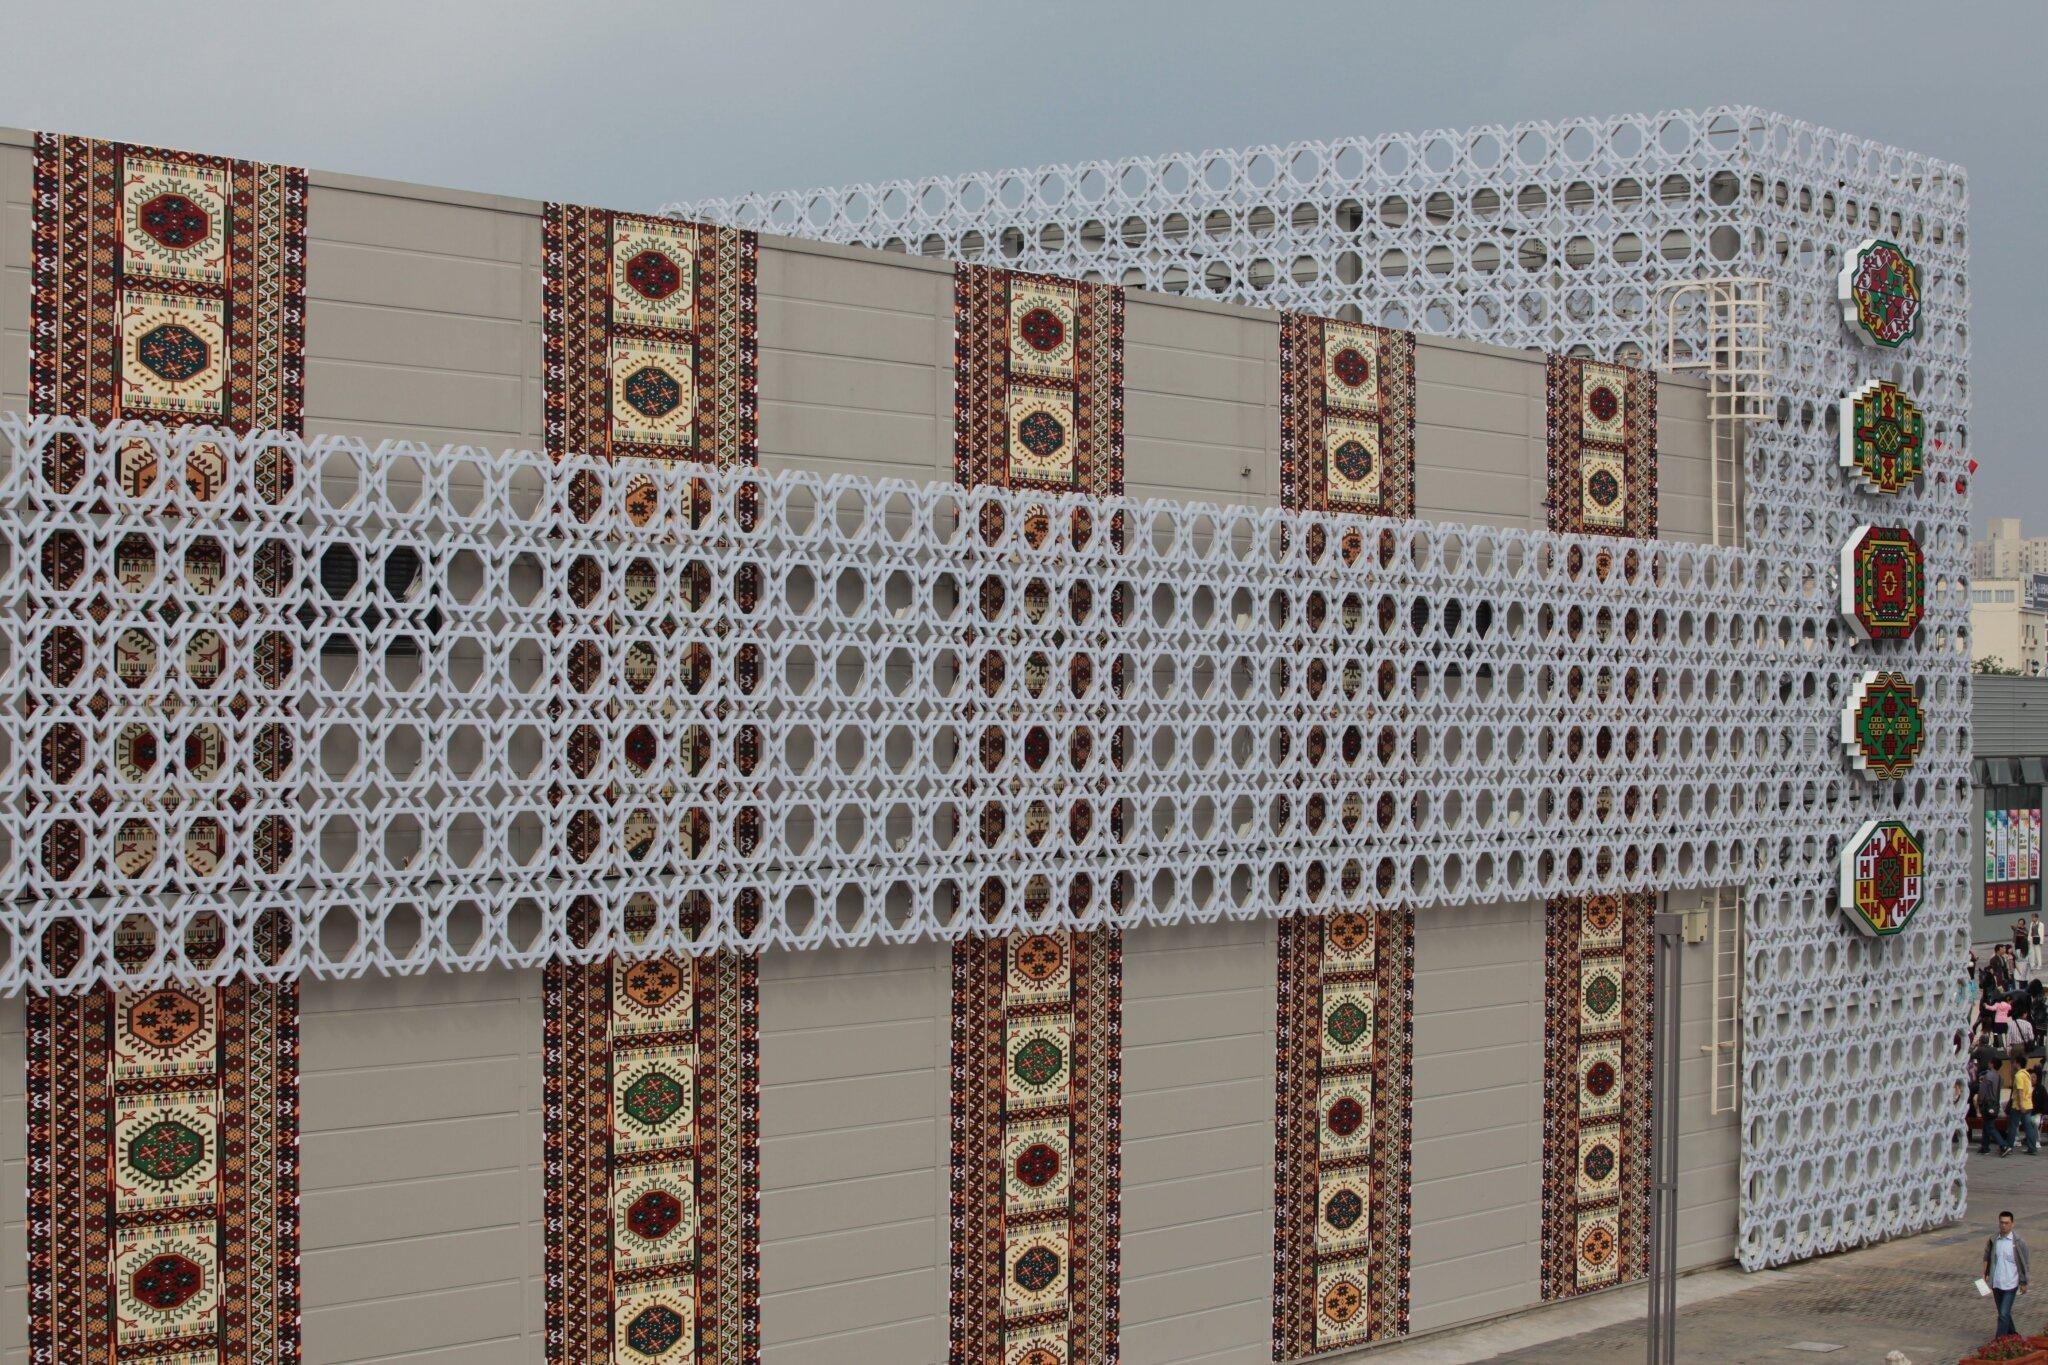 Pavillon du Turkmenistan